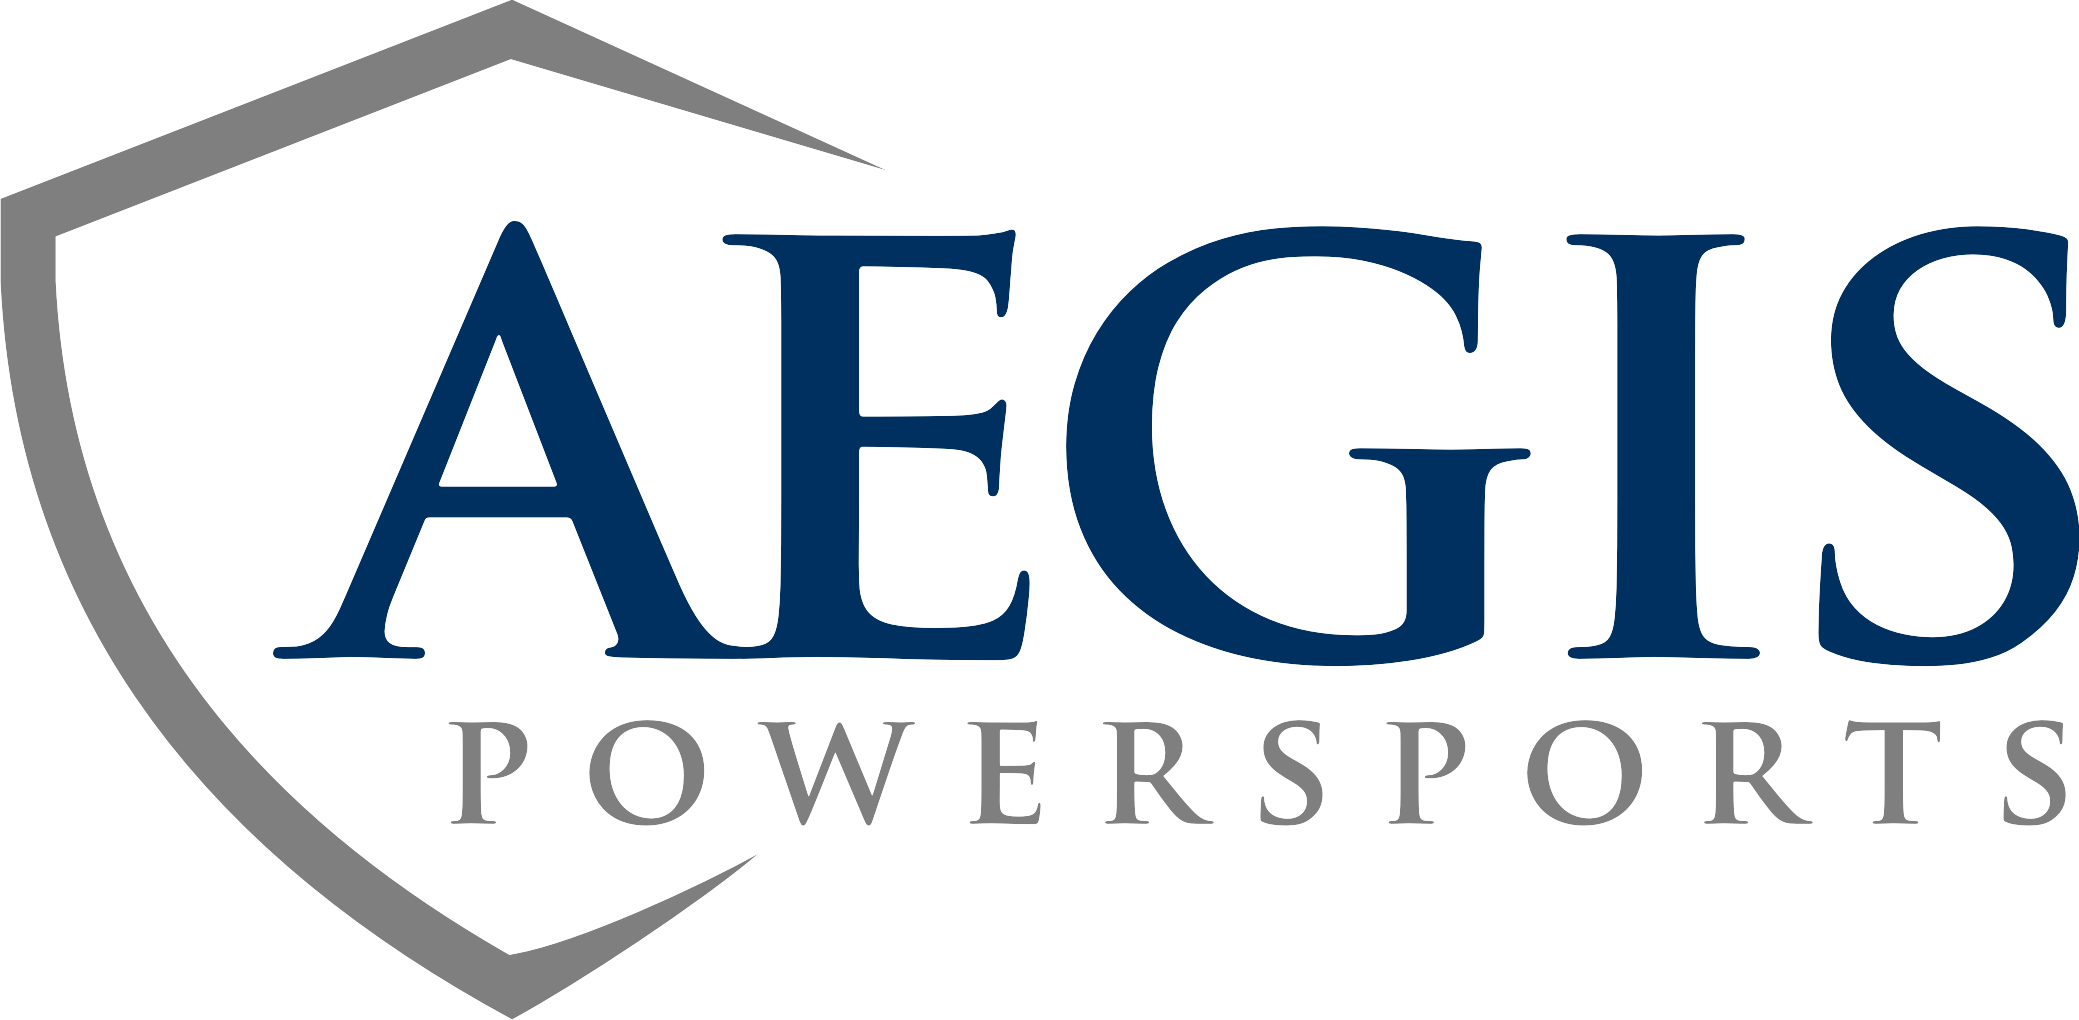 Aegis Powersports